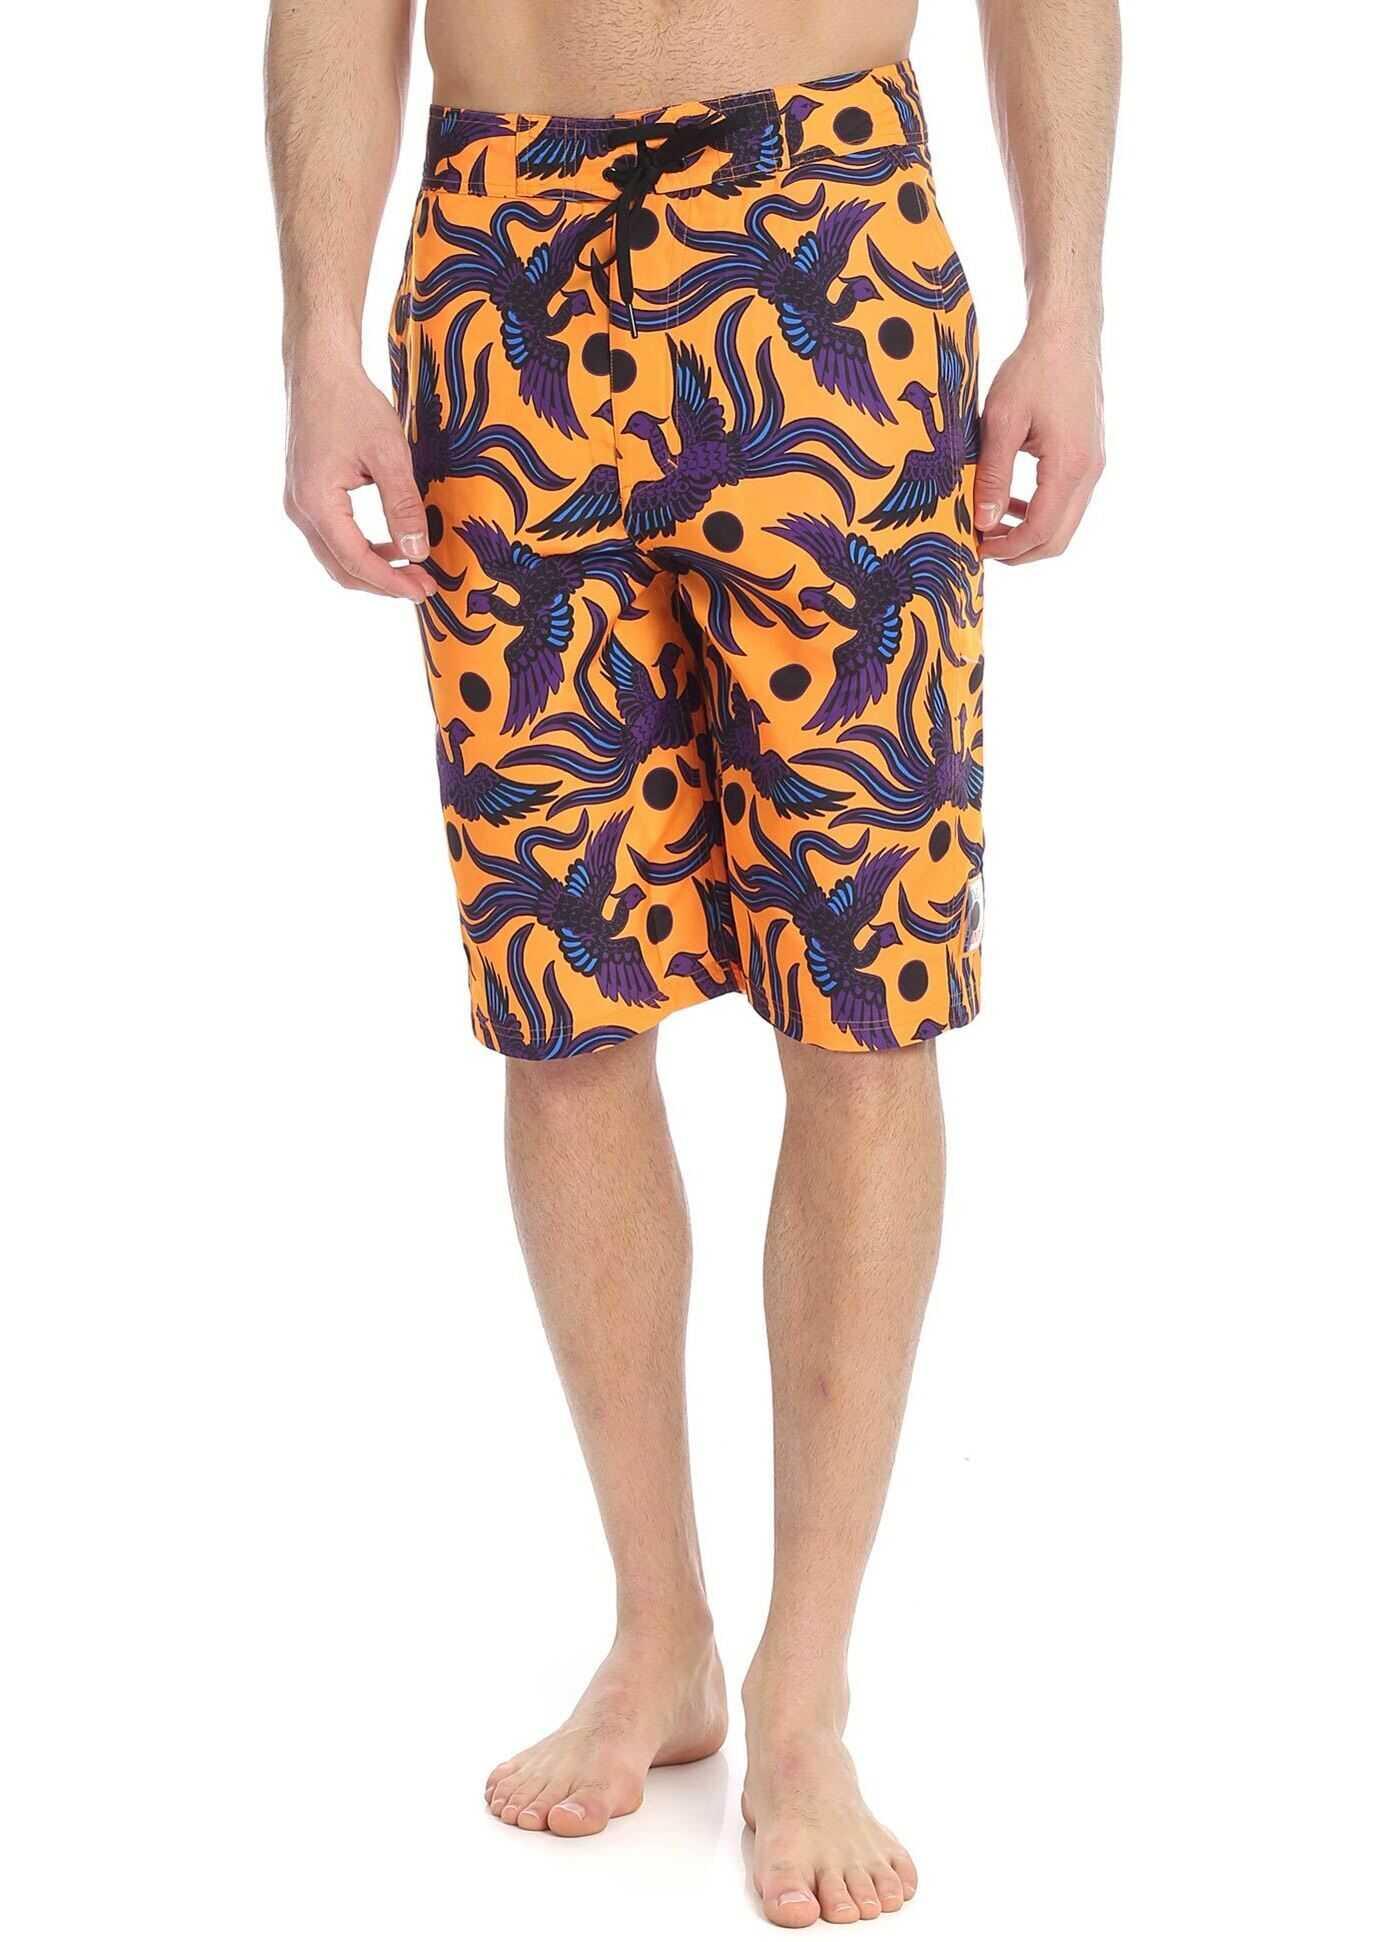 Kenzo Flying Phoenix Swimsuit In Orange Orange imagine